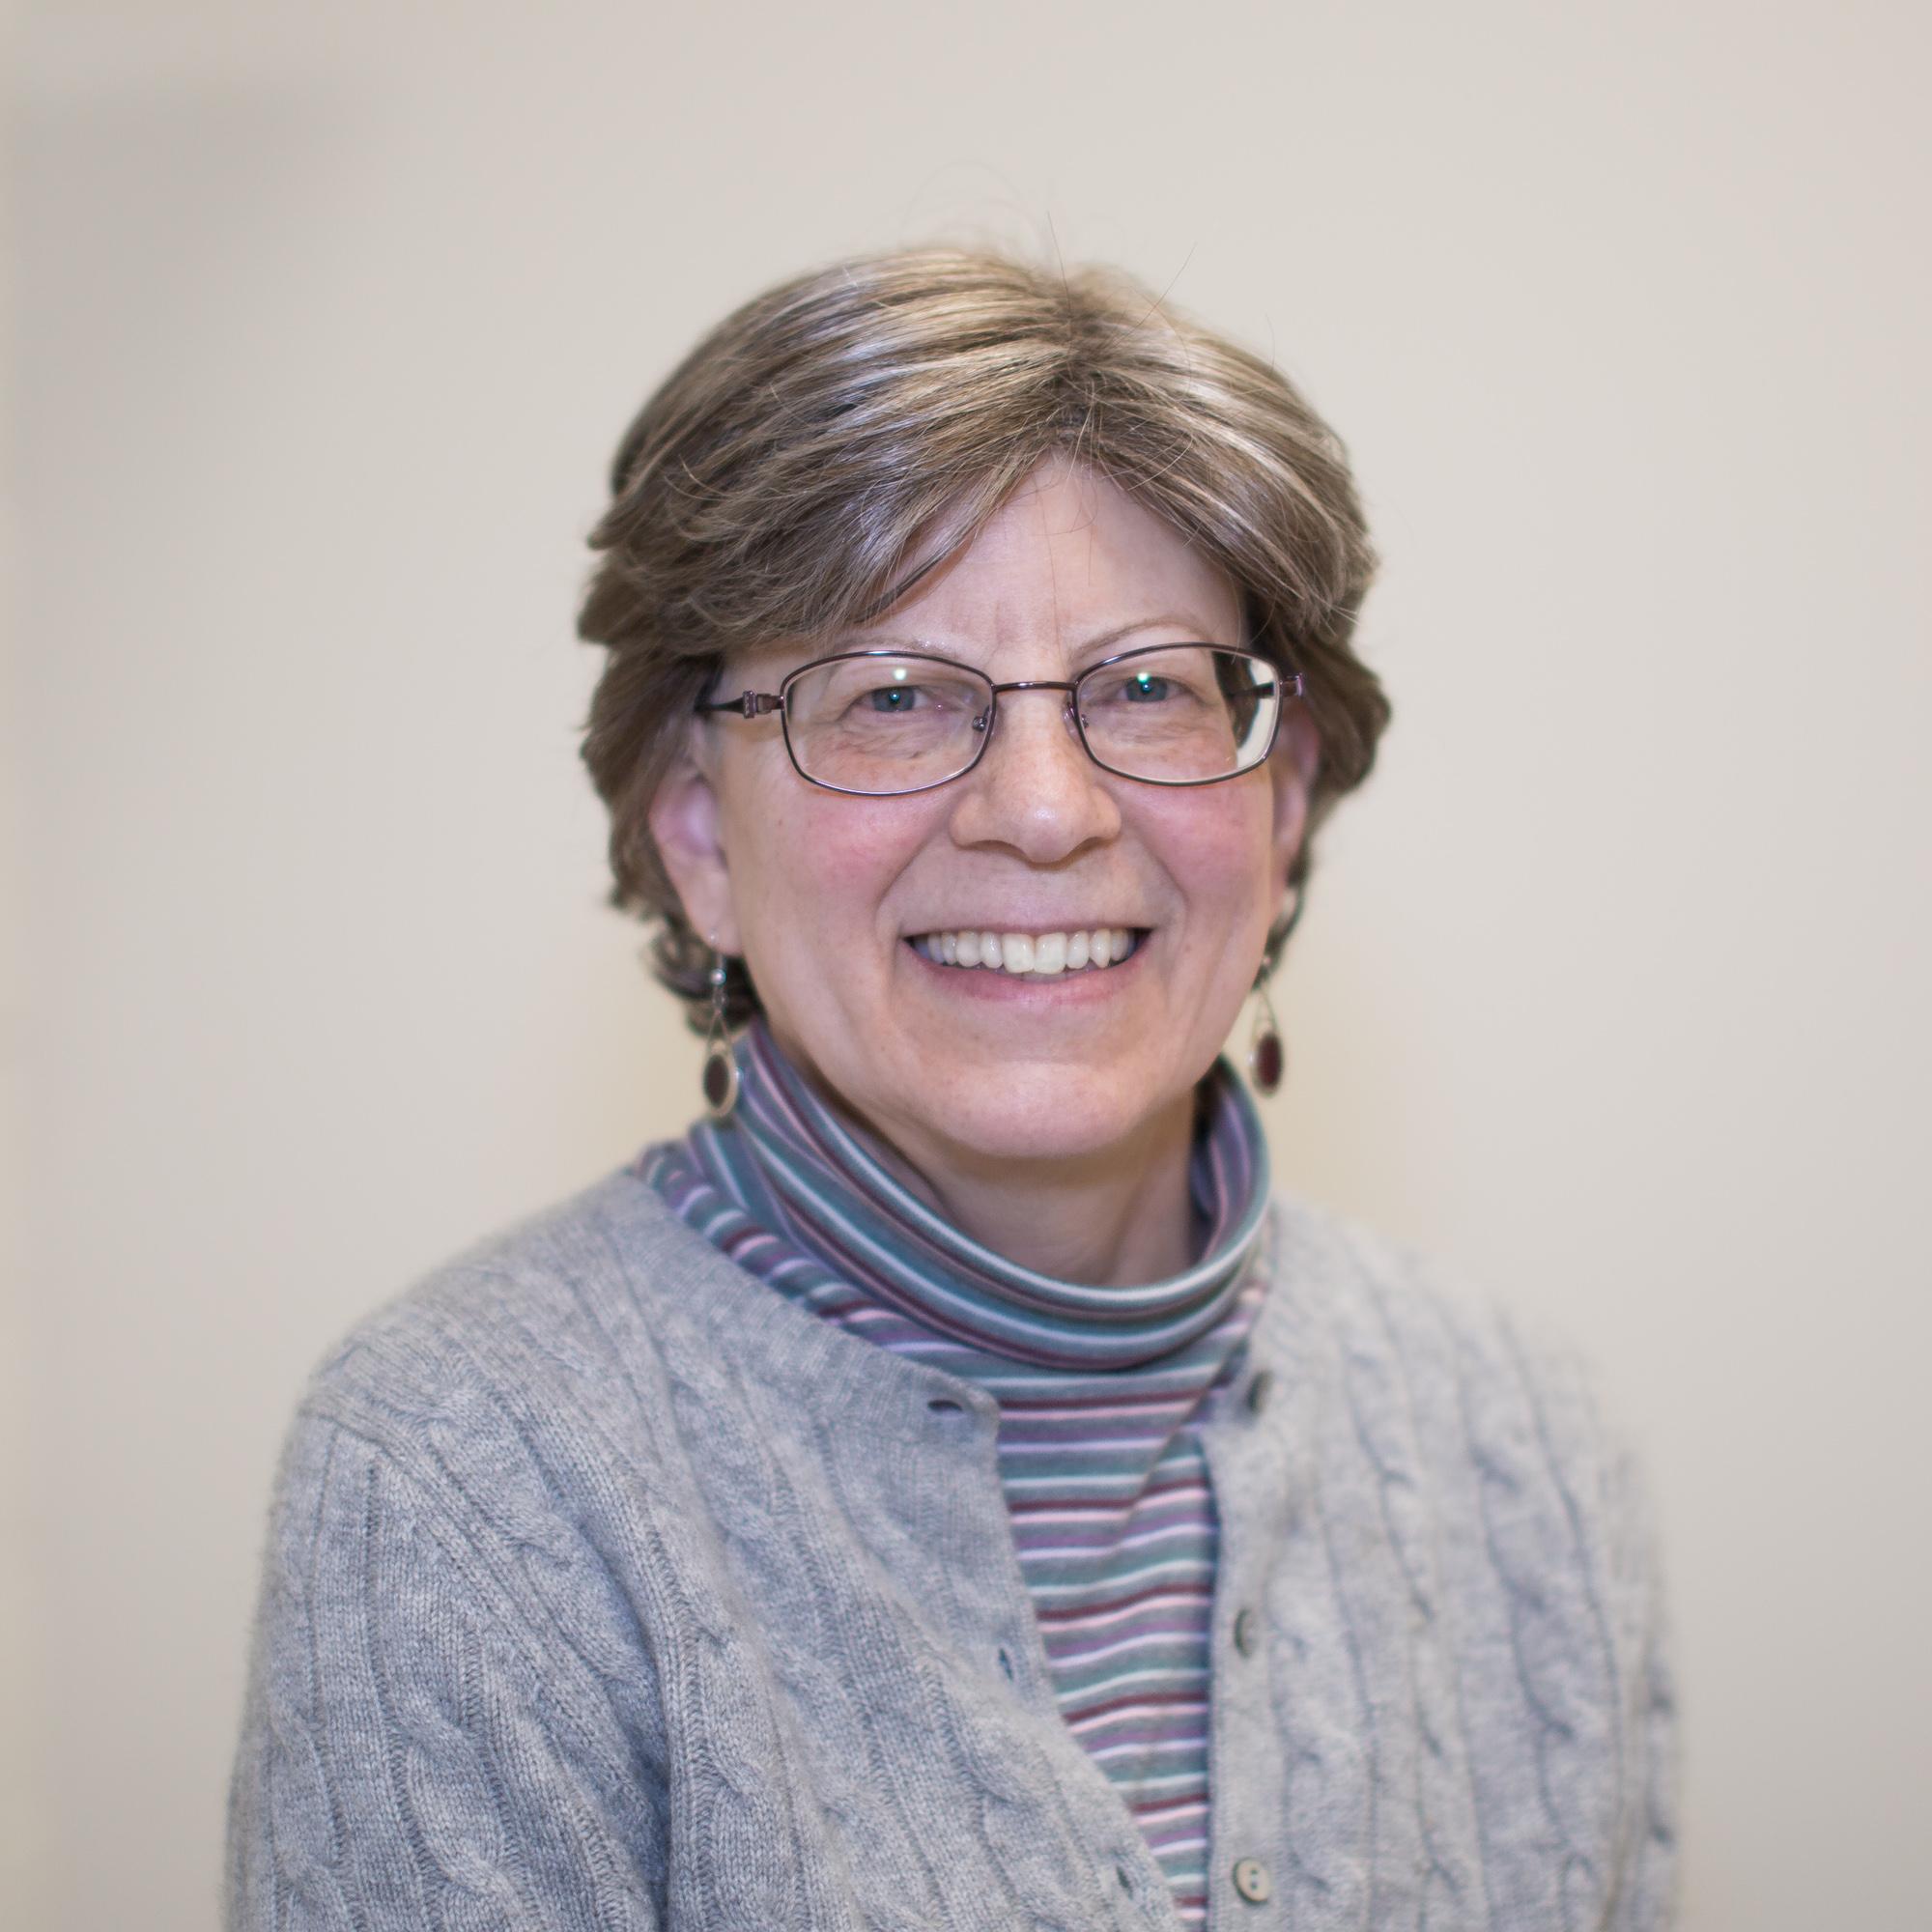 Barbara Malt, Professor of Psychology at Lehigh University